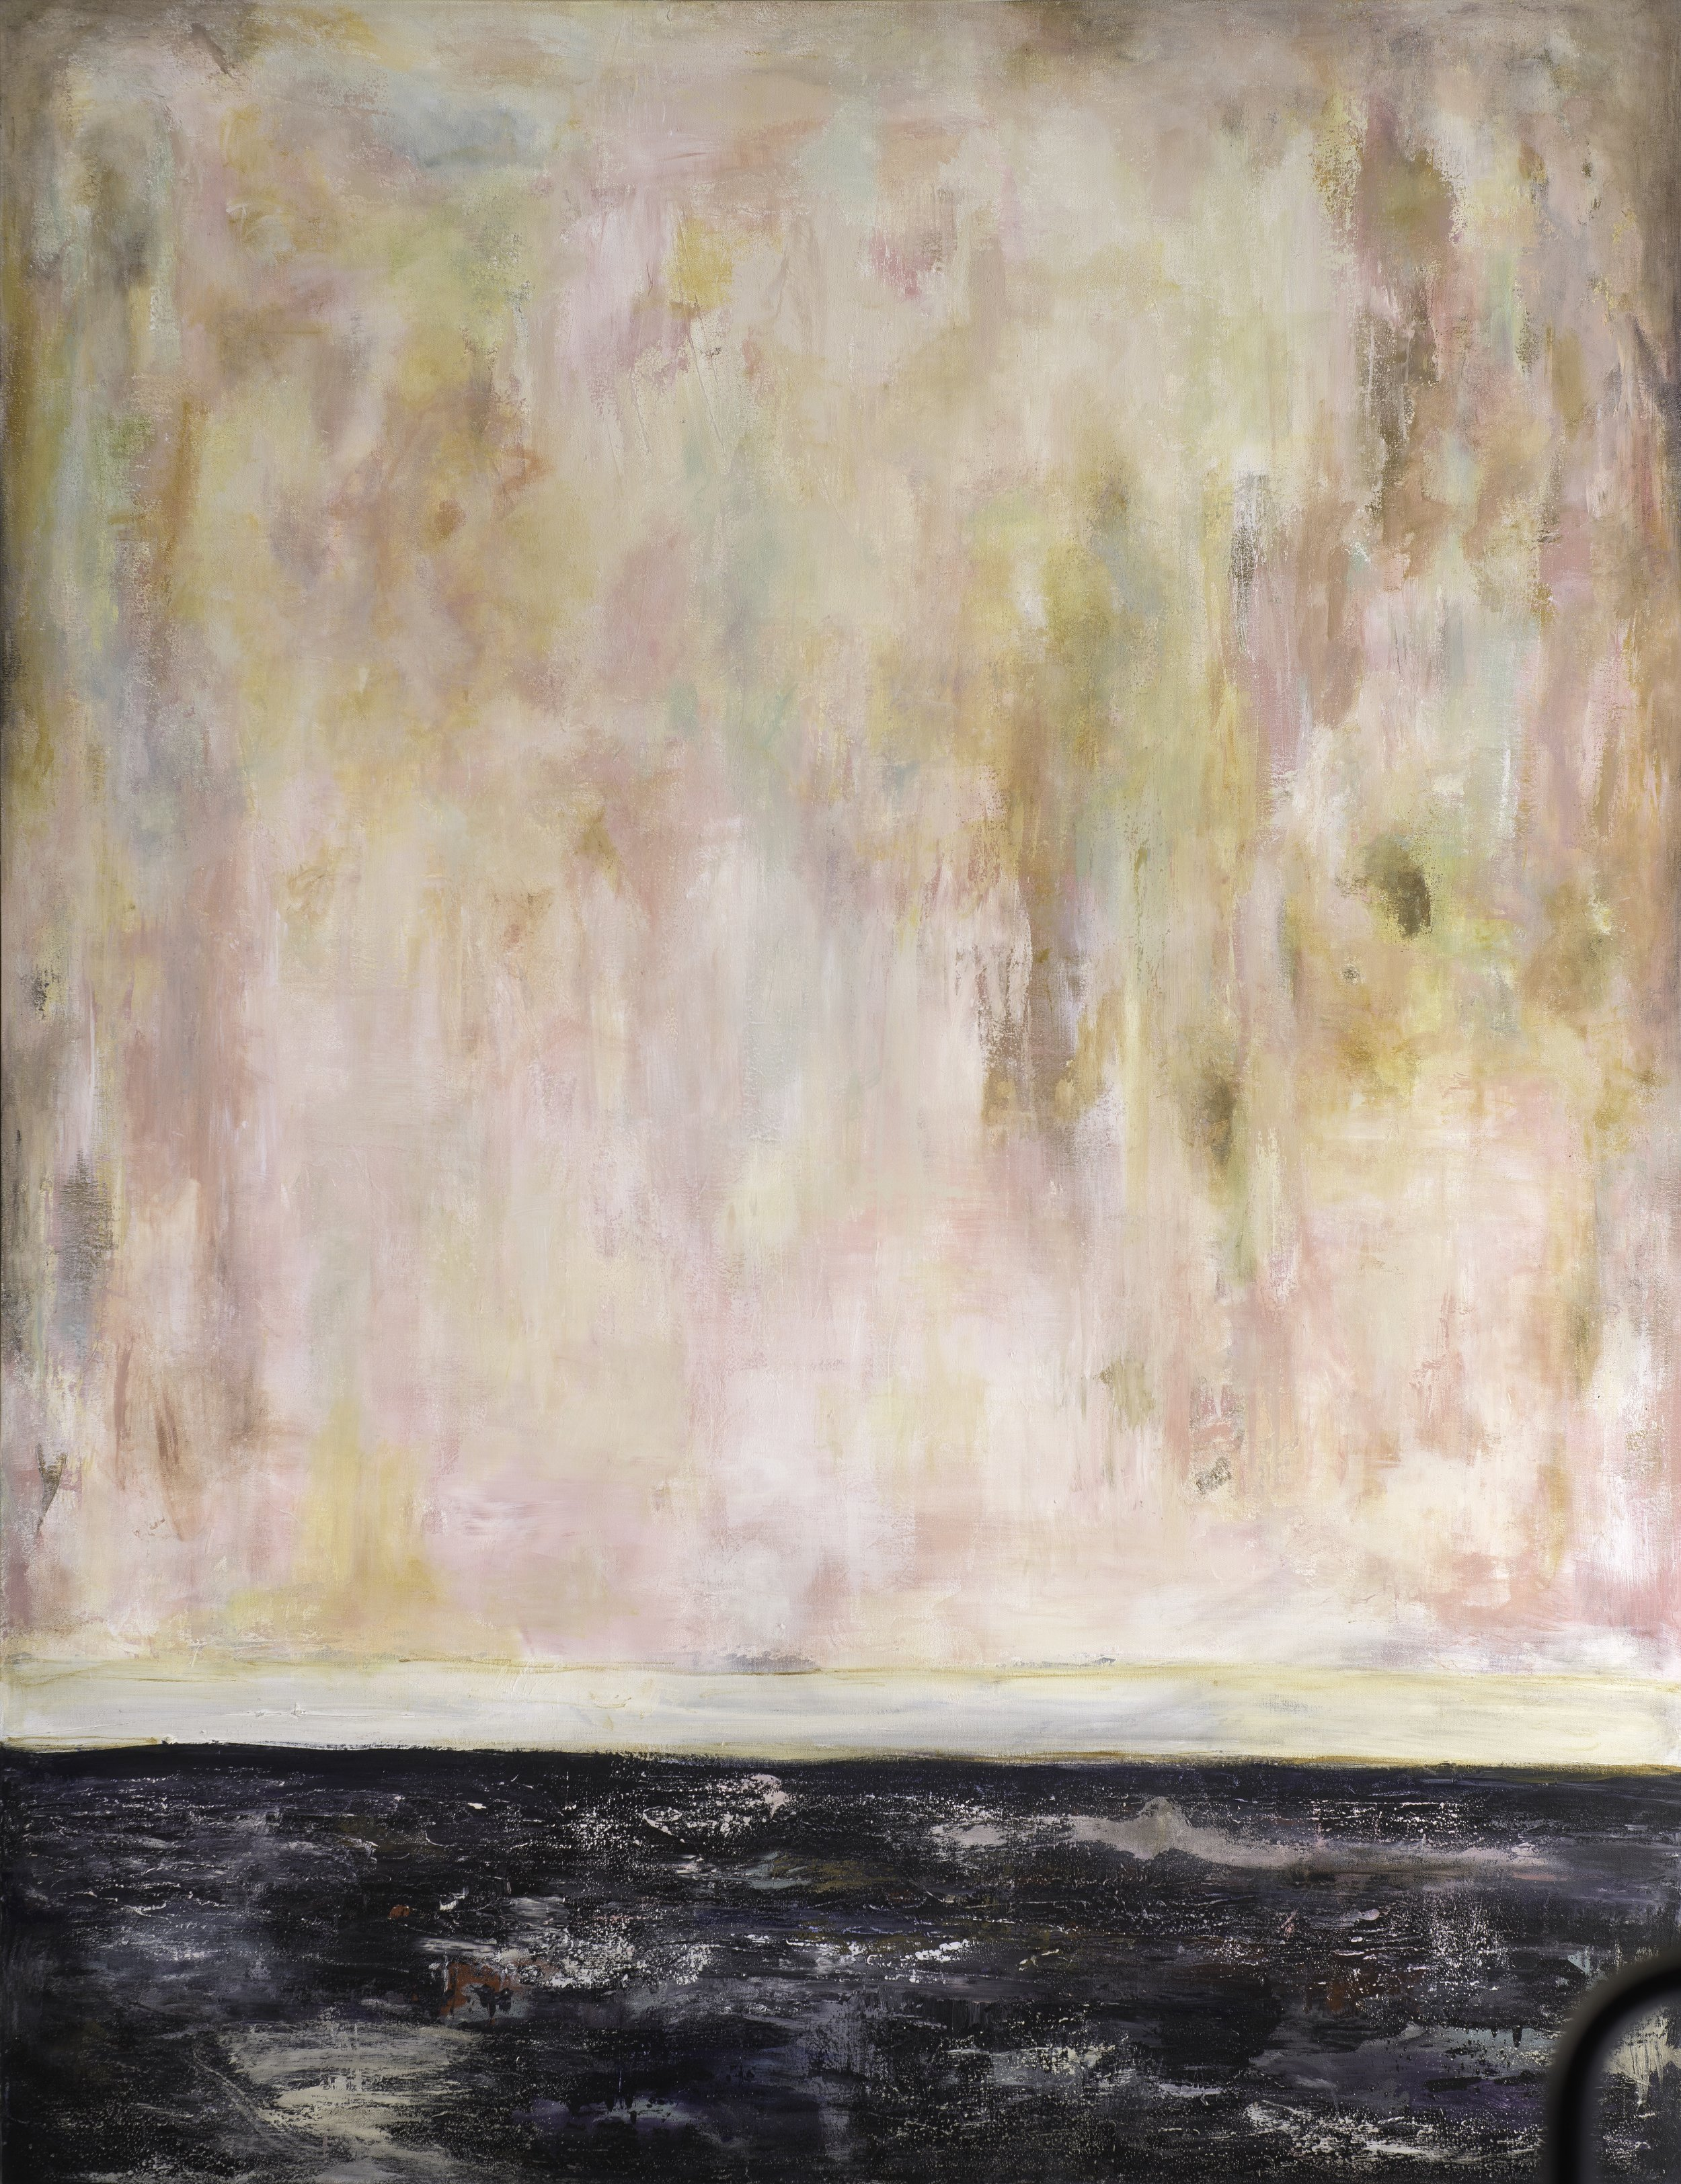 """Wall of Love"" - 72 x 60"""